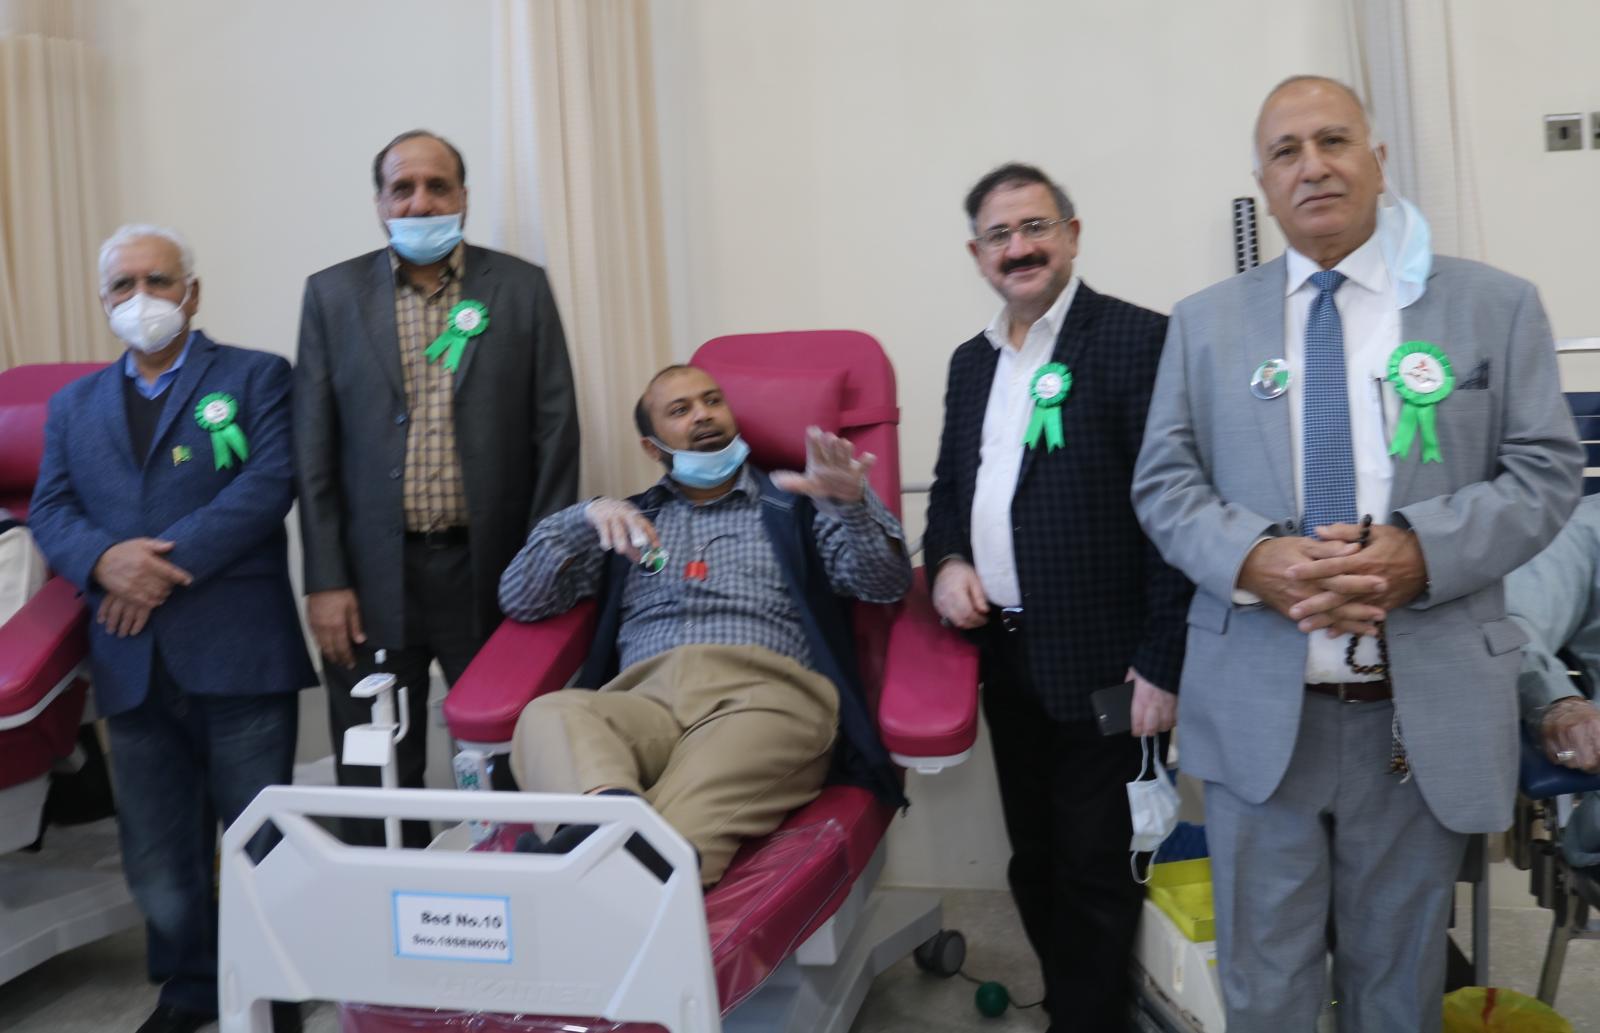 Blood donation camp organized by Pak Donors on Quaid-e-Azam's birthday